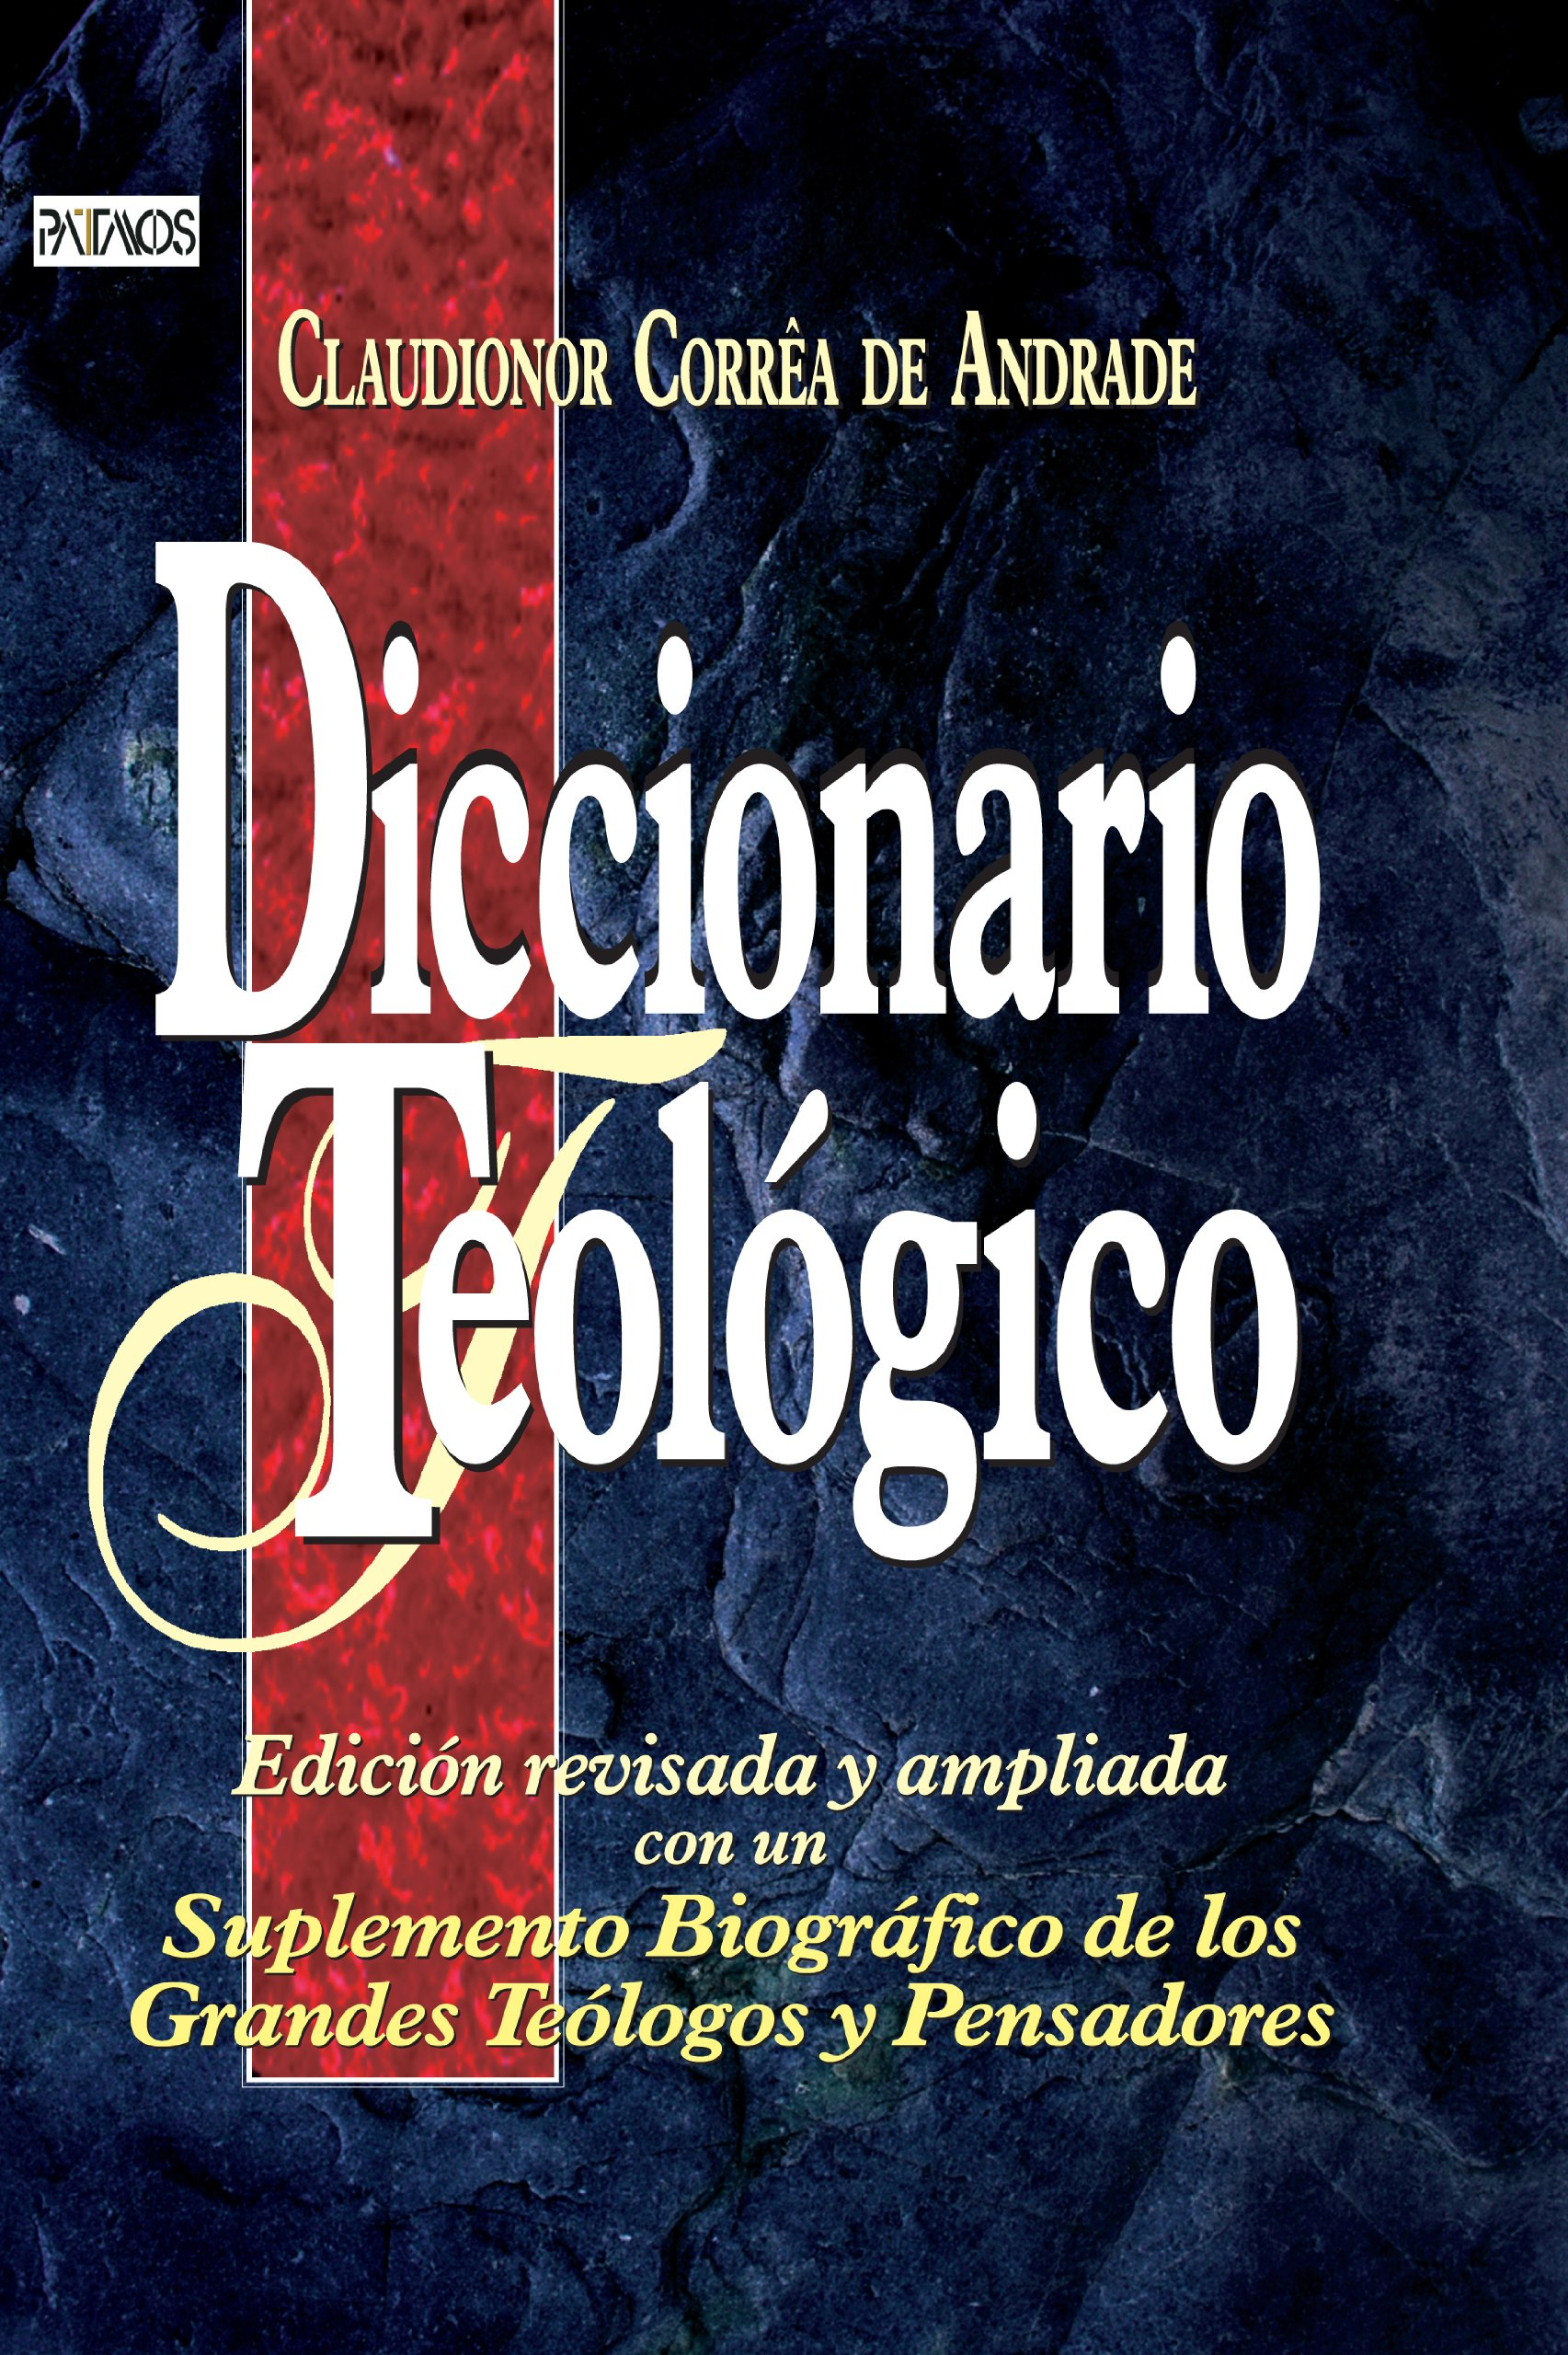 Diccionario Teologico (Spanish Edition): Claudionor Correa de Andrade:  9781588020147: Amazon.com: Books